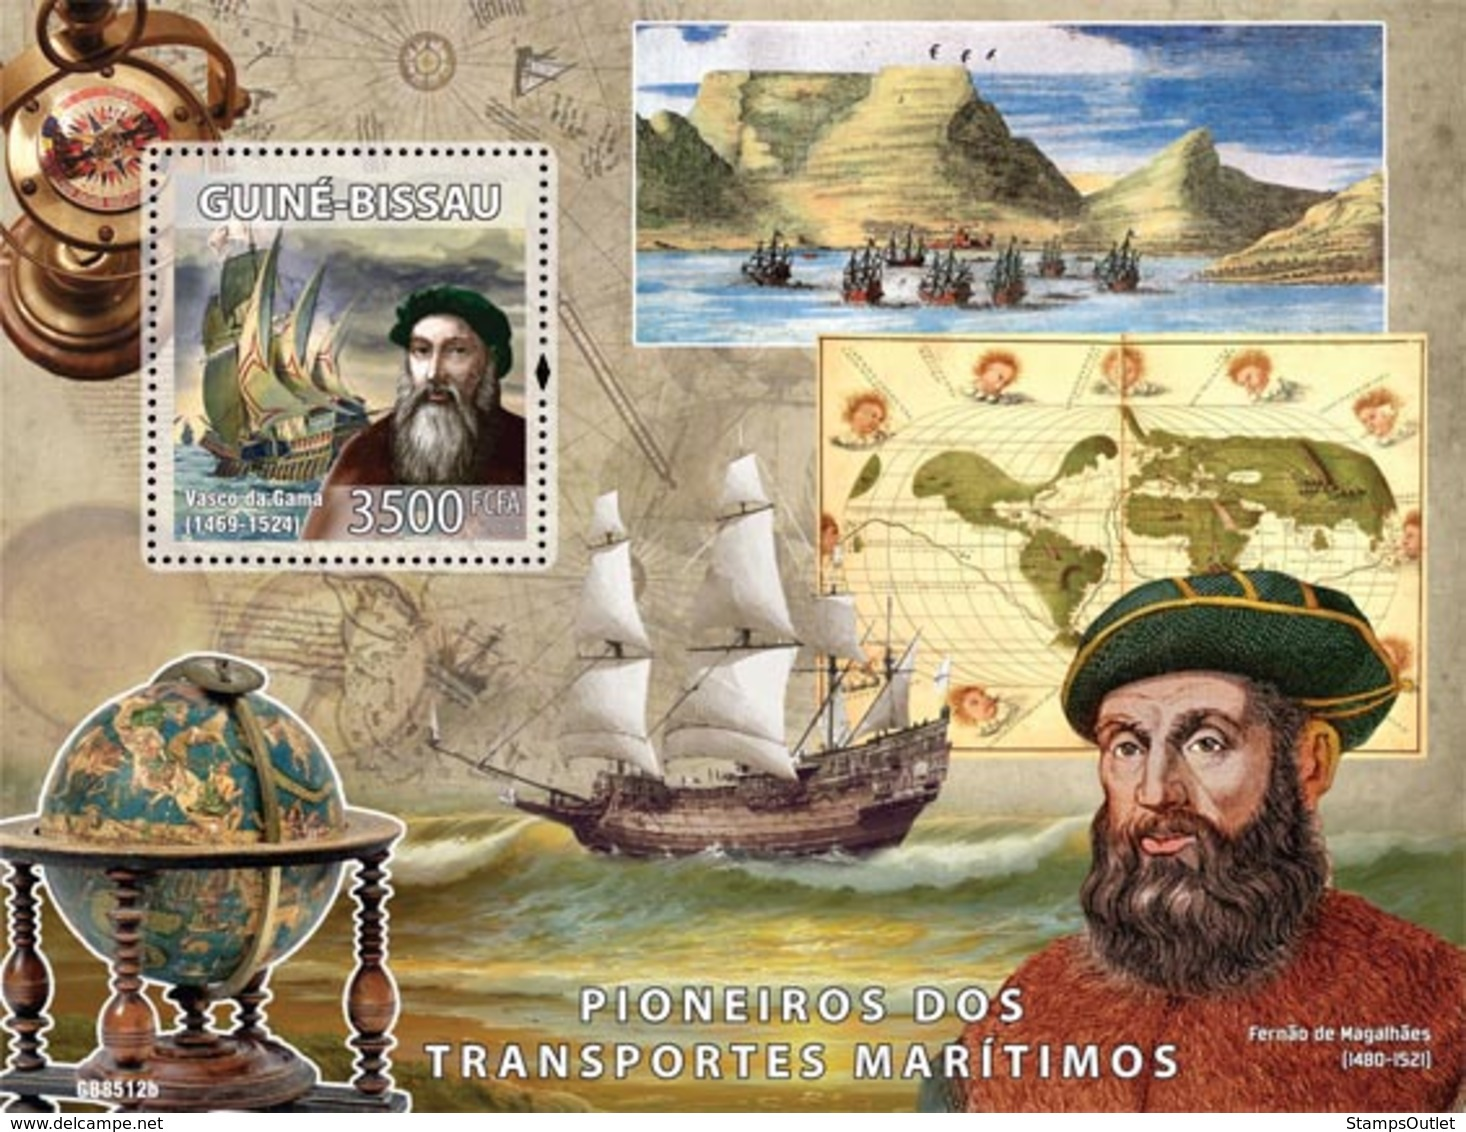 Guinea - Bissau 2008 - Pioneers Of Sea Transport (Vasco De Gama, F.Magelanes) S/s Y&T 435, Michel 4006/BL681 - Guinea-Bissau